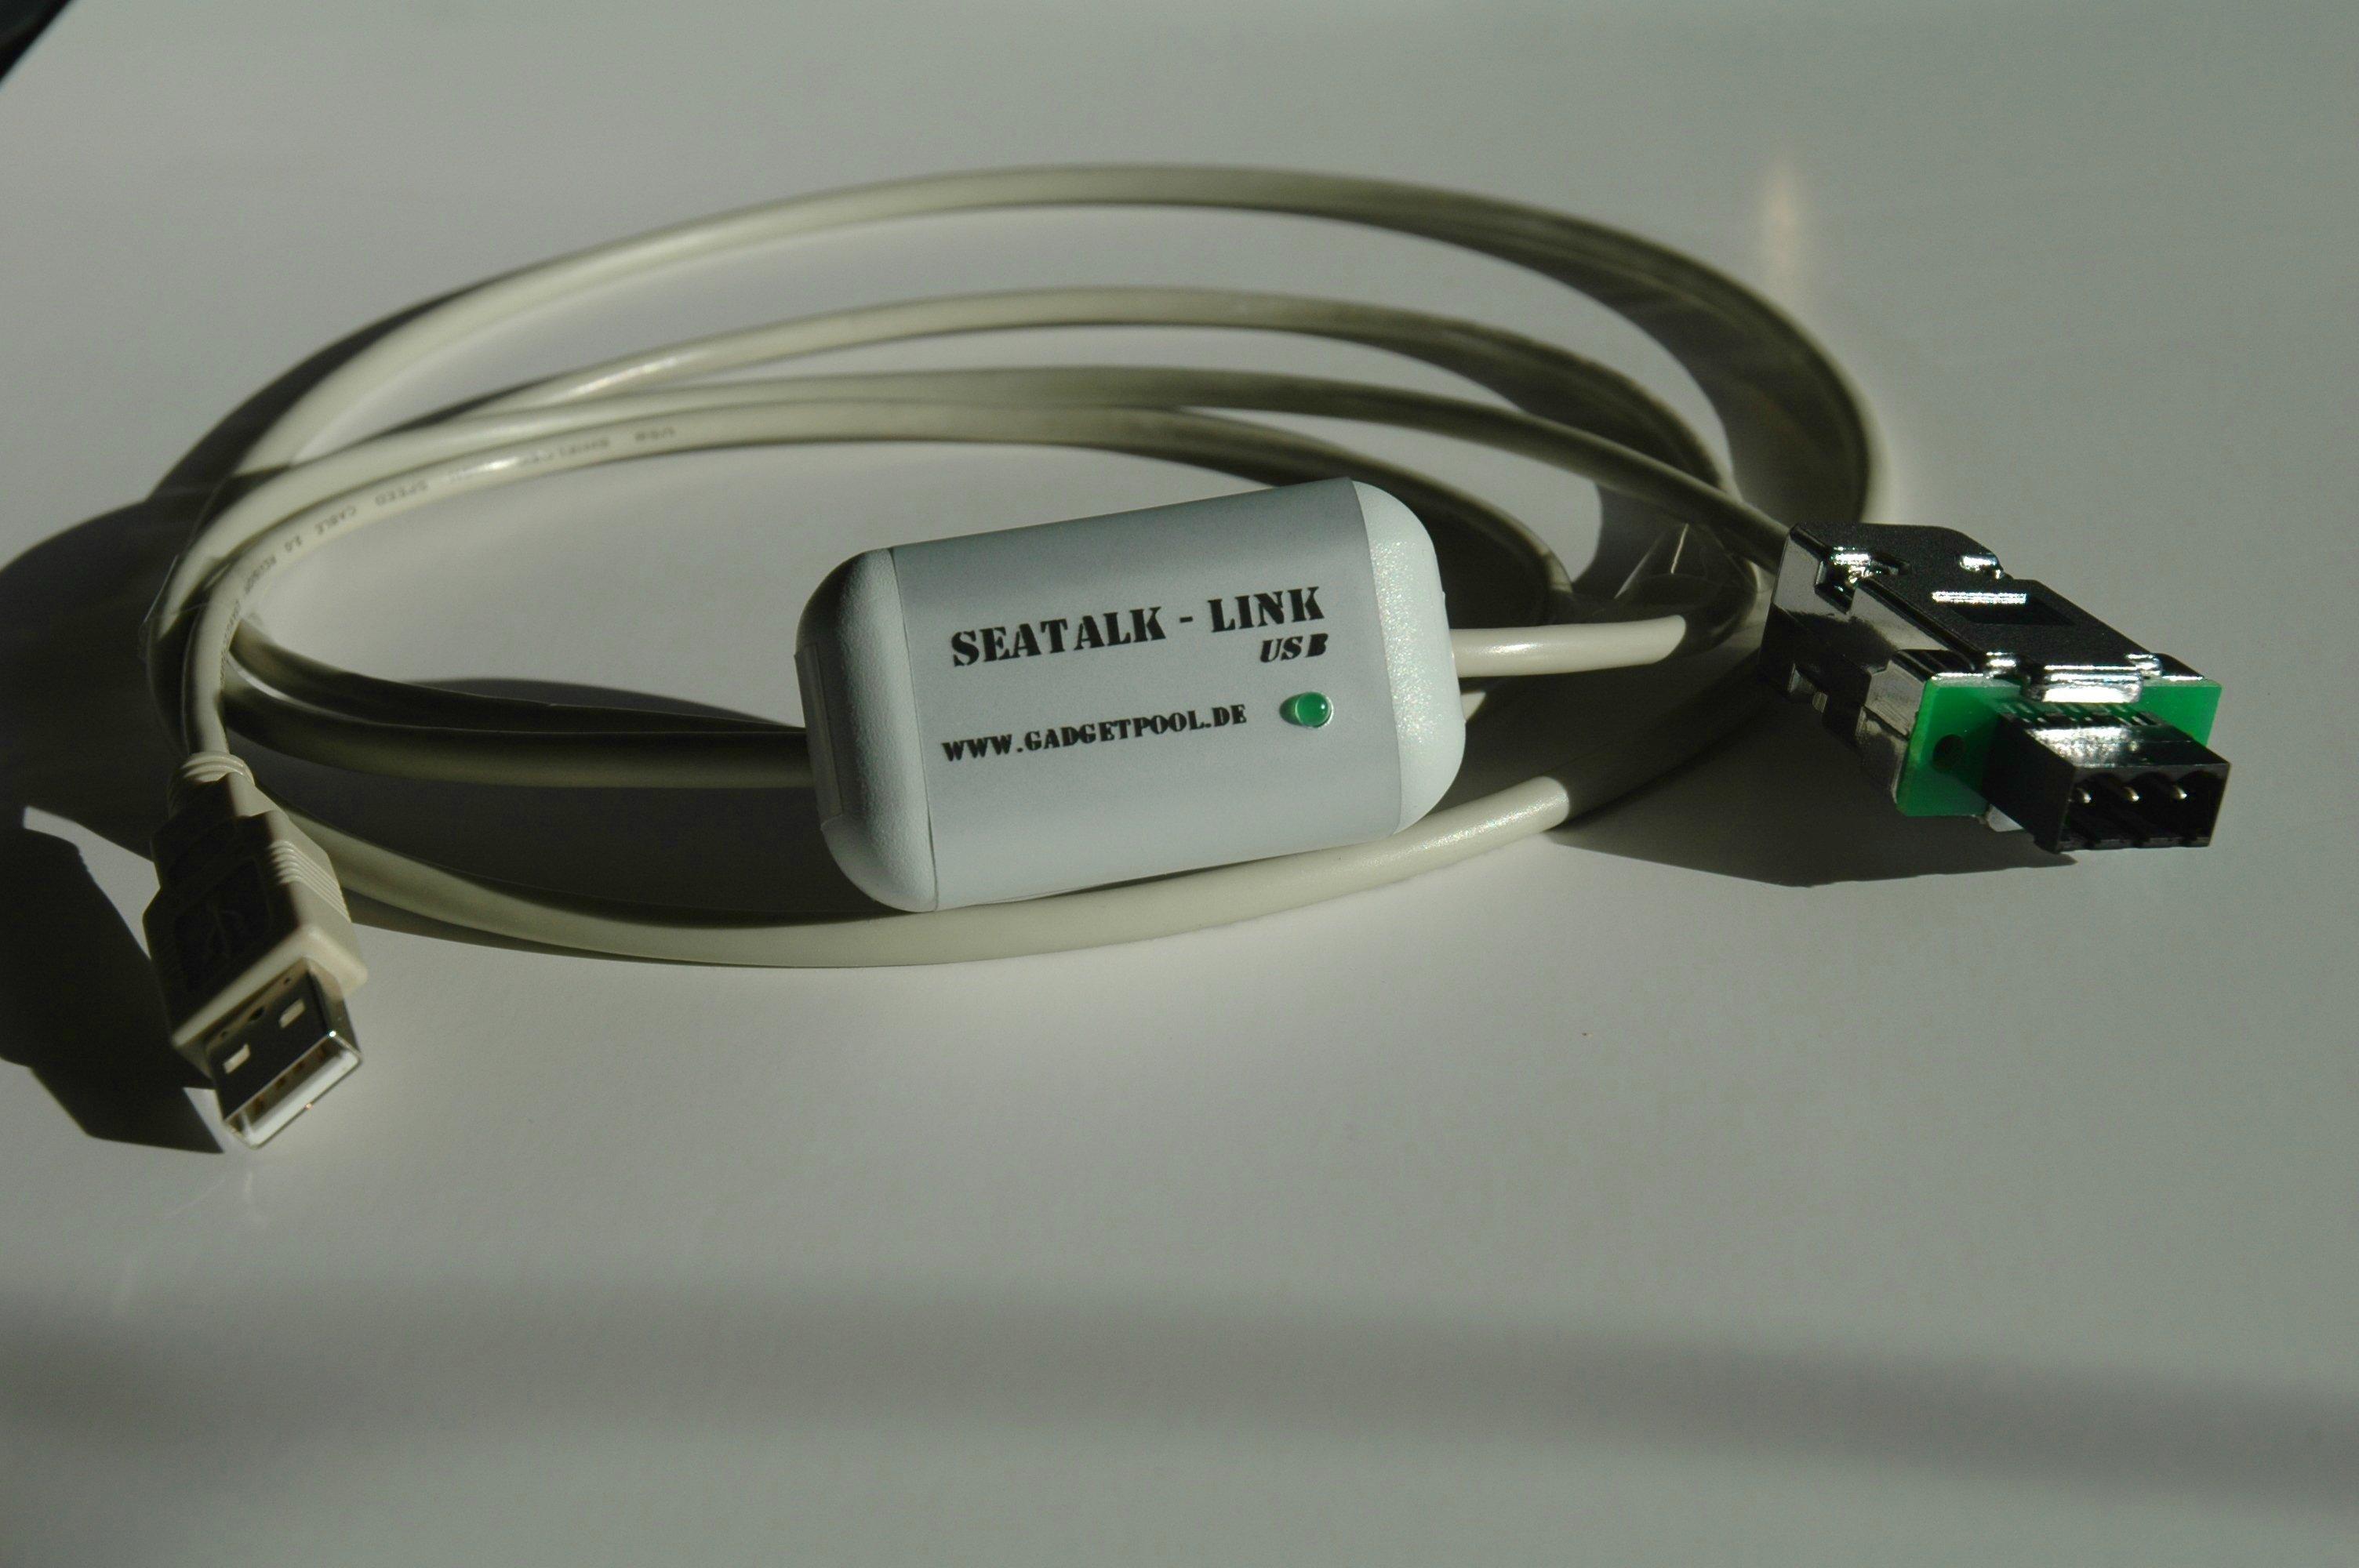 SeaTalk Link